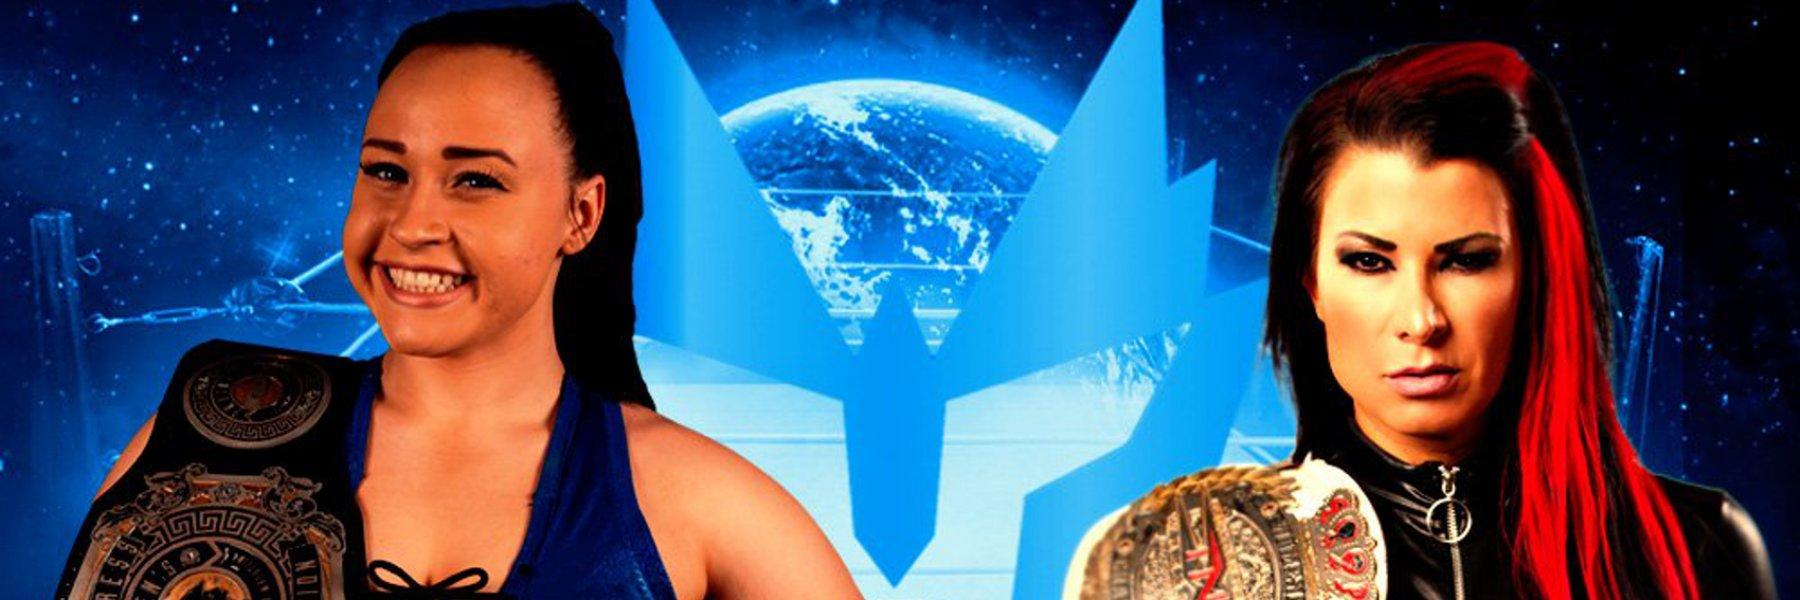 Jordynne Grace vs Lisa Marie Varon - PROGRESS Title Match @ Warrior